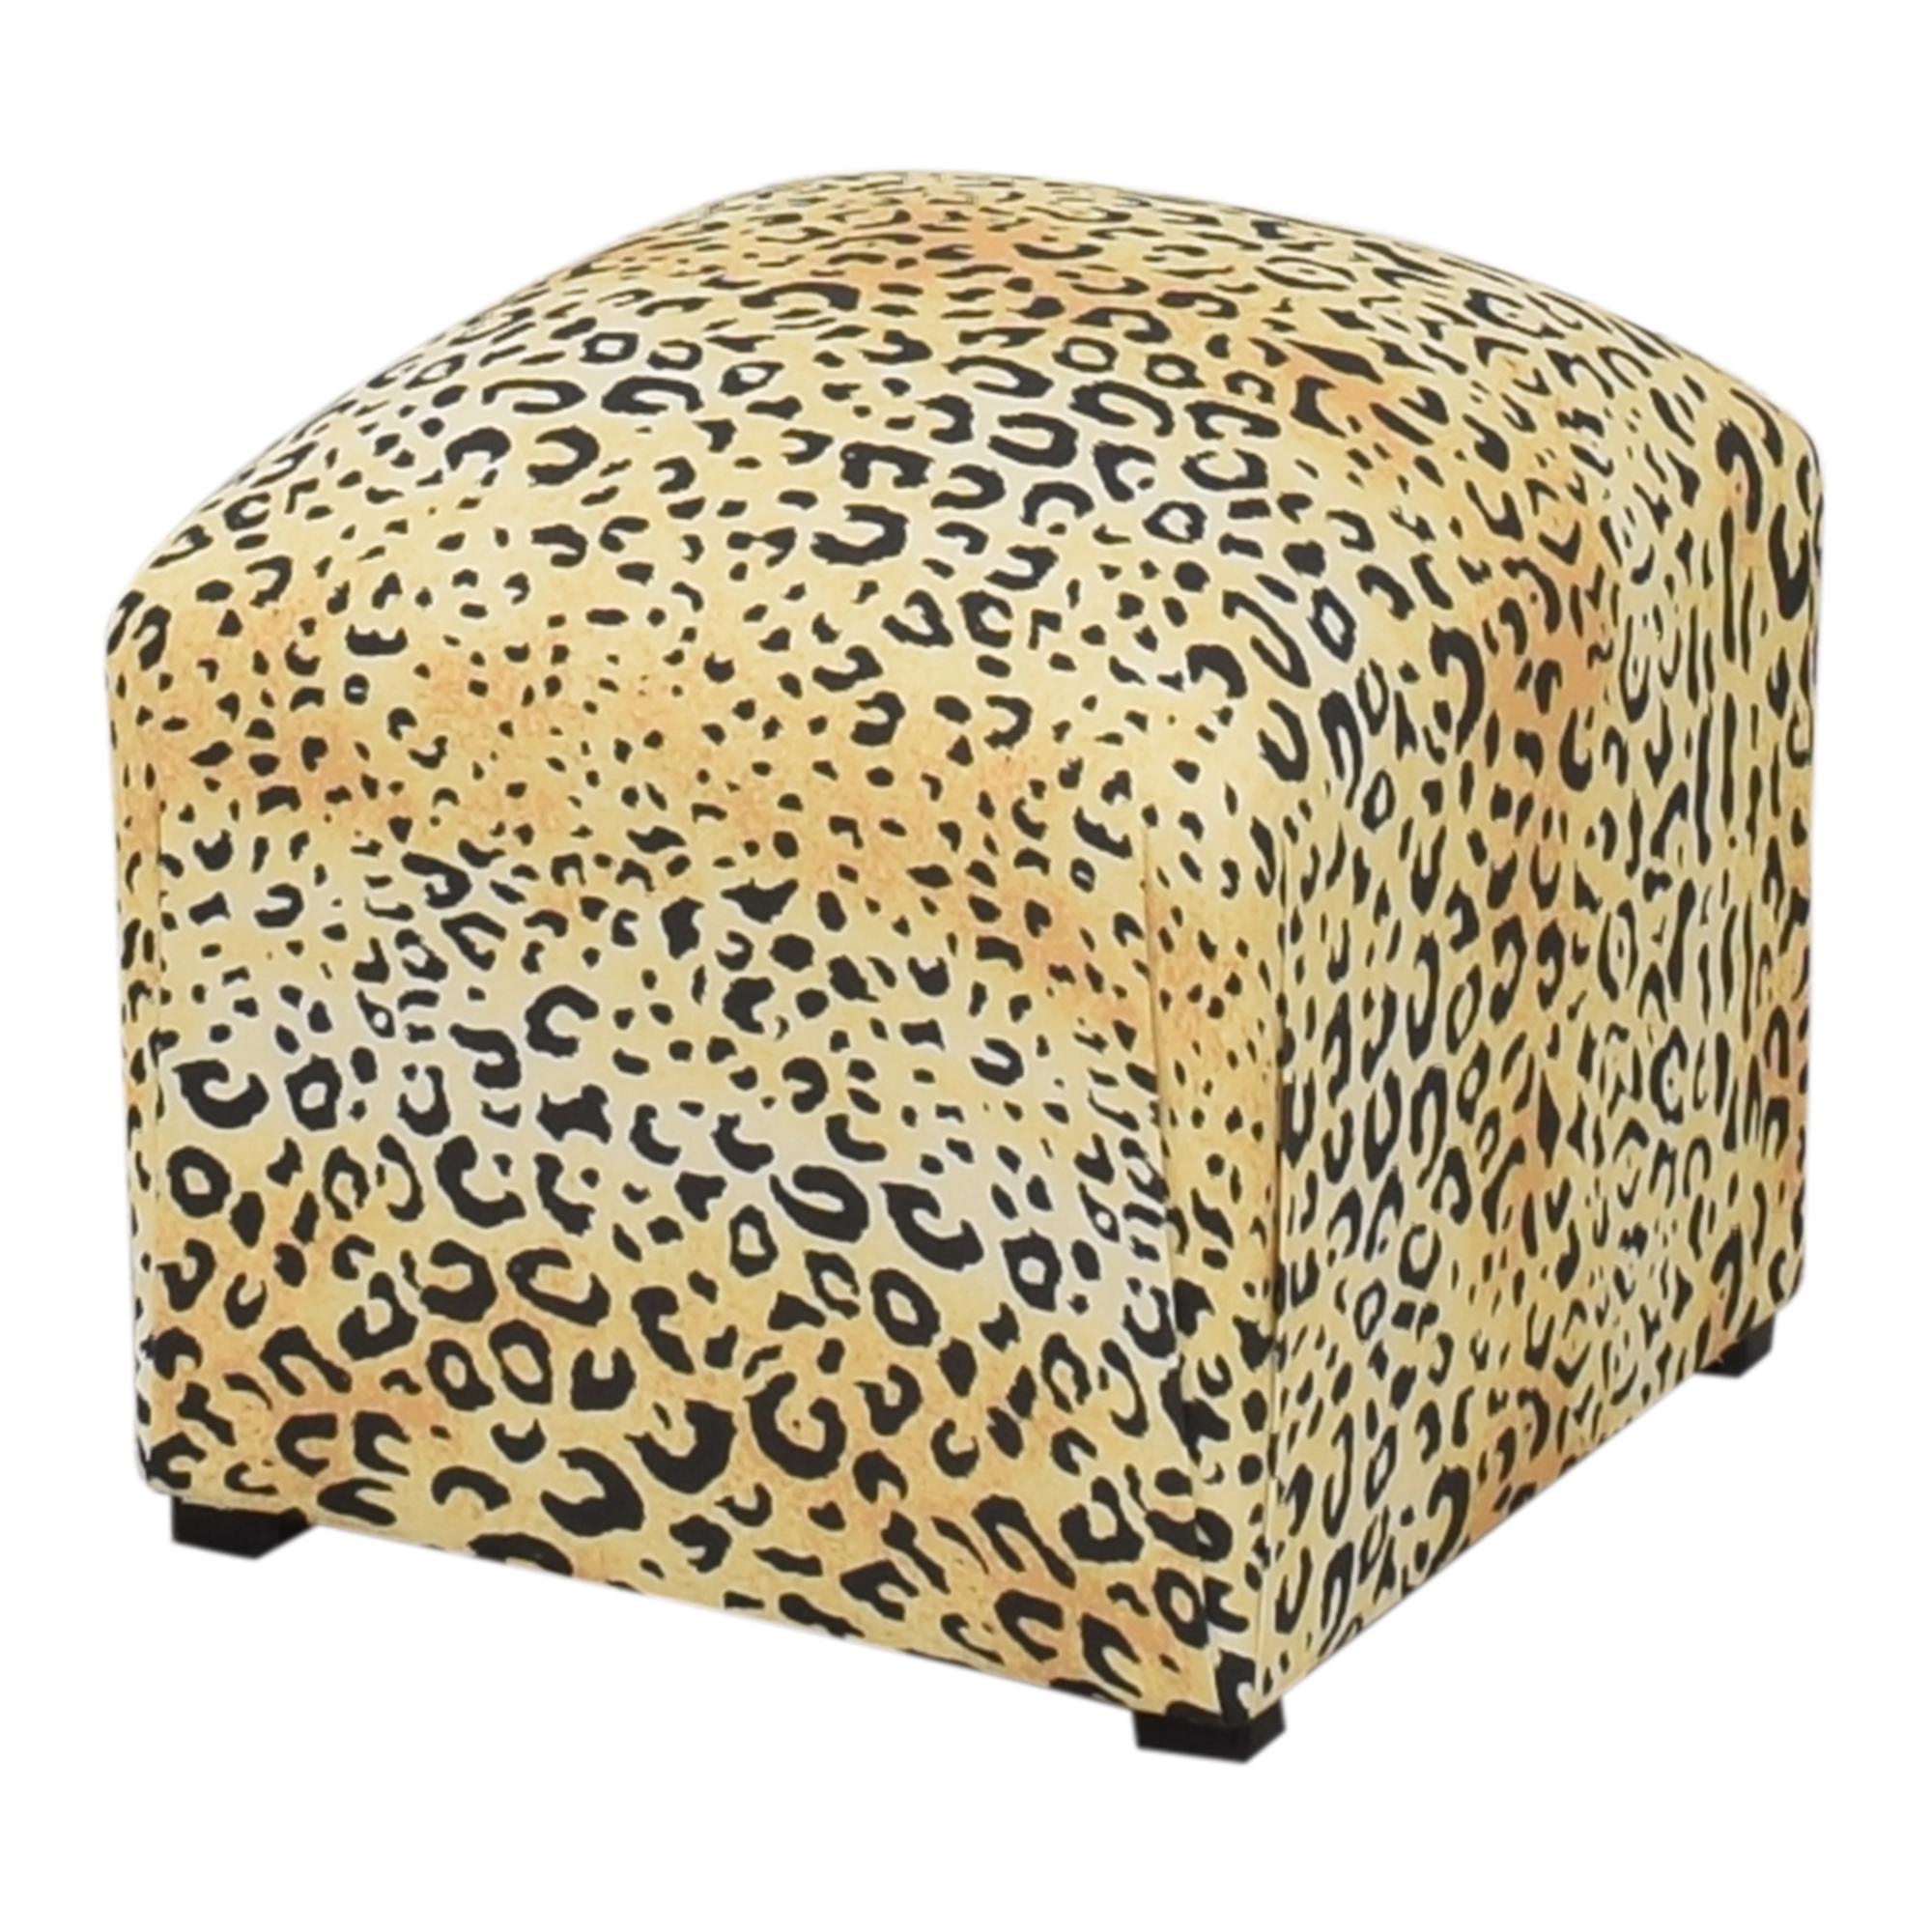 The Inside Leopard Deco Ottoman The Inside